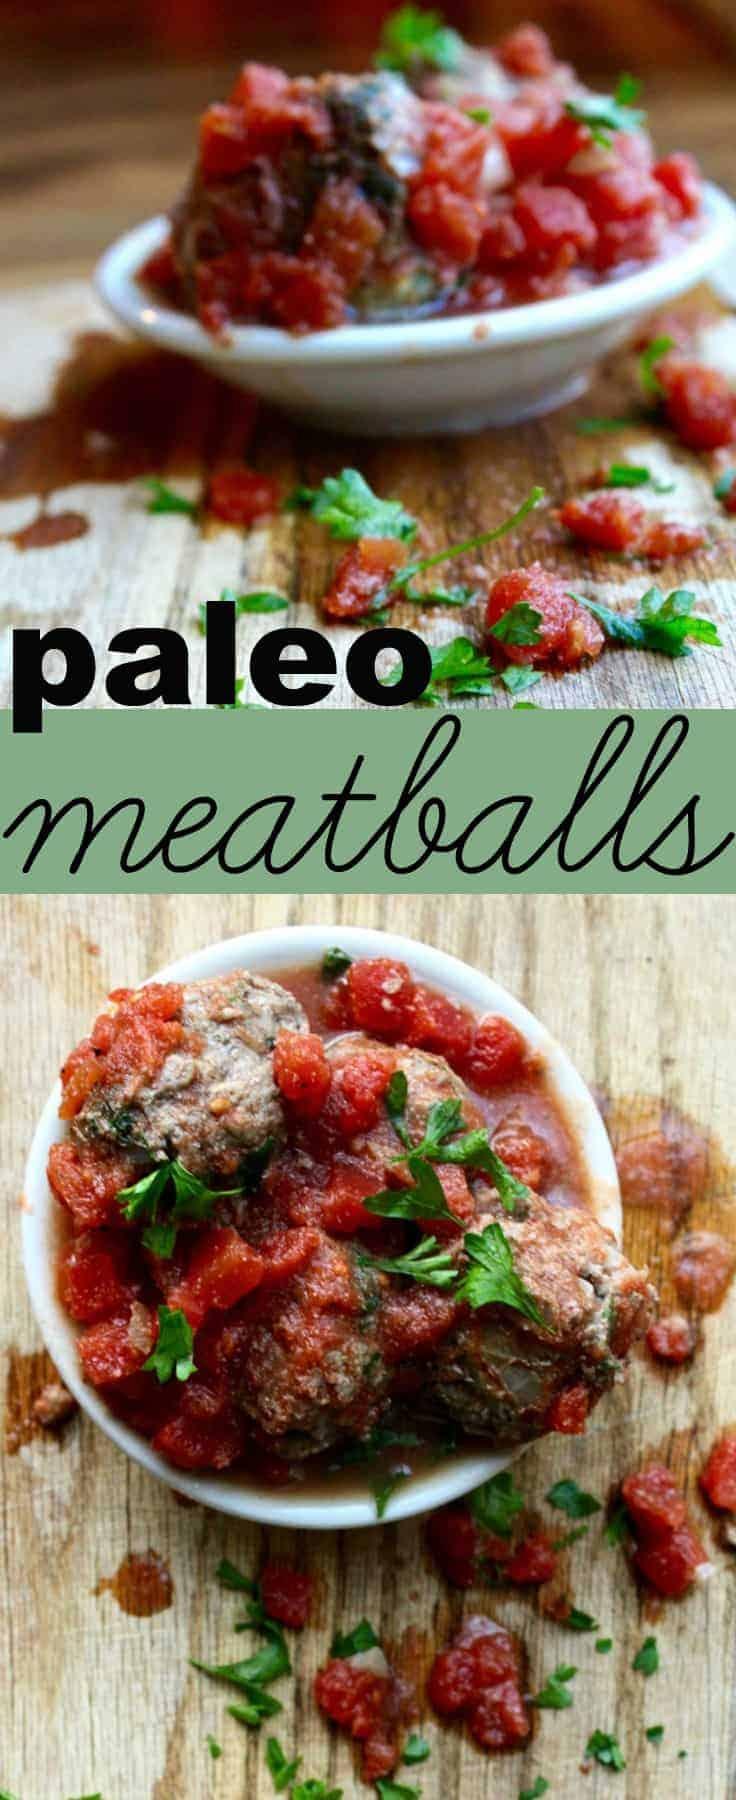 paleo meatballs